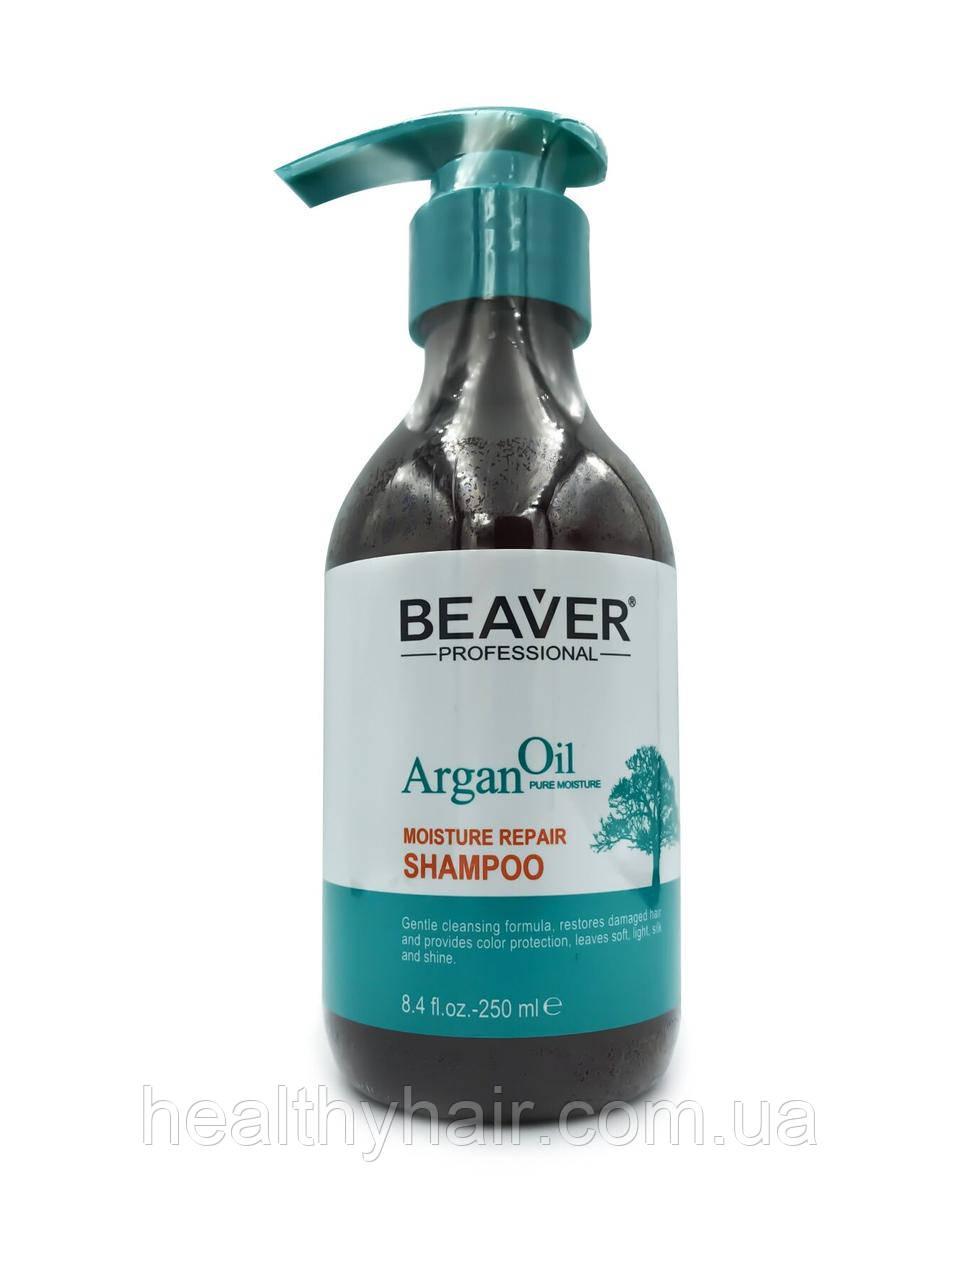 Beaver Argan Oil Moisture Repair Shampoo Шампунь питающий восстанавливающий с аргановым маслом 250 мл